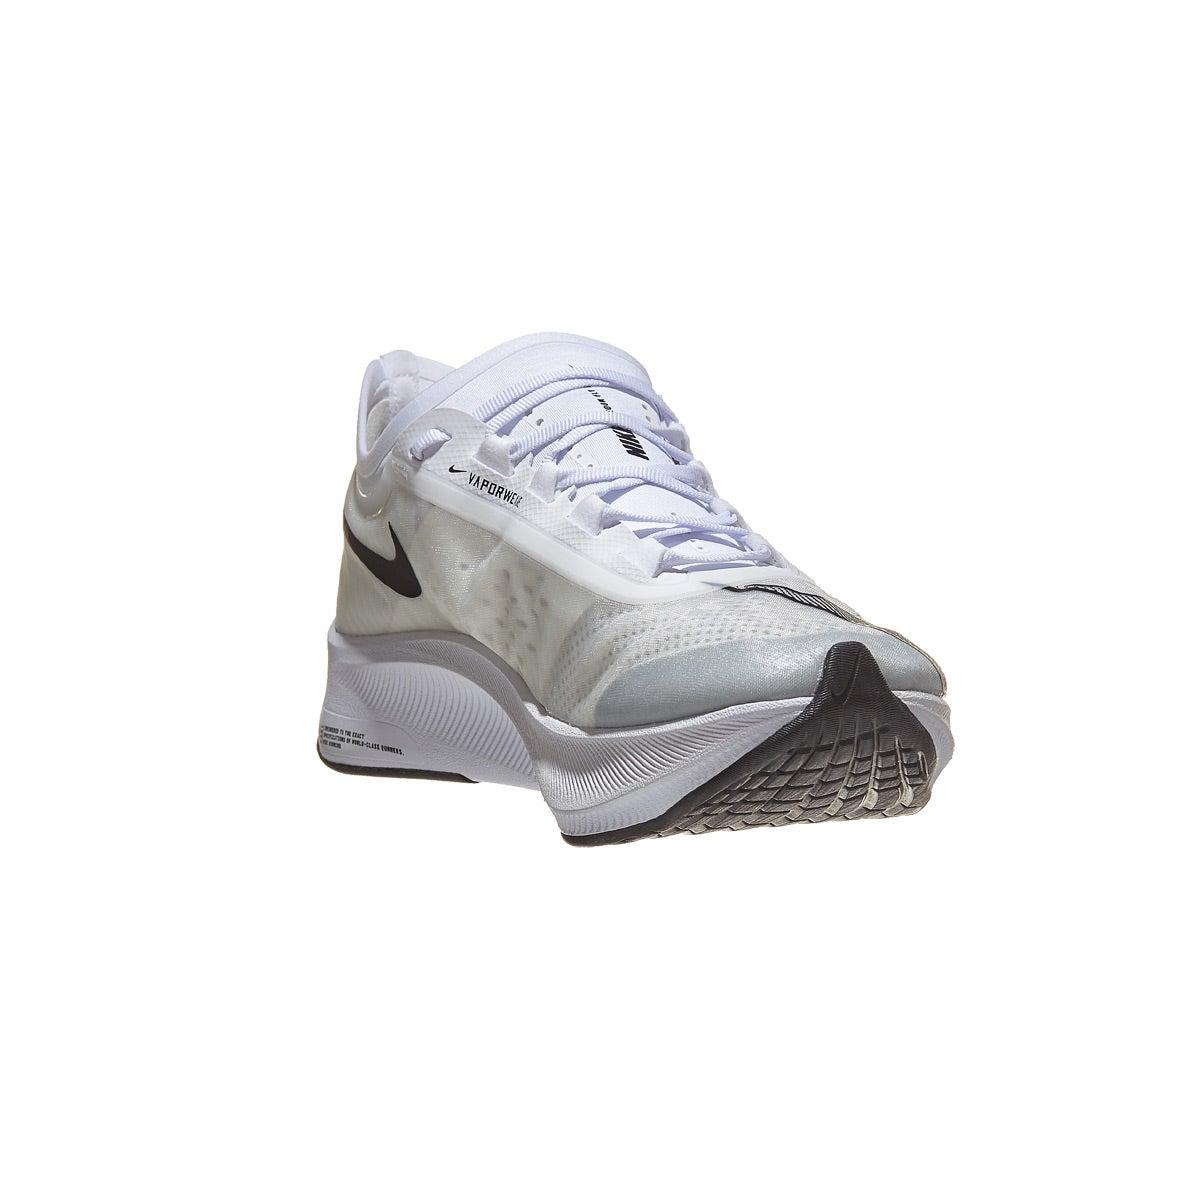 Nike Zoom Fly 3 Men's Shoes WhiteBlackGrey 360° View